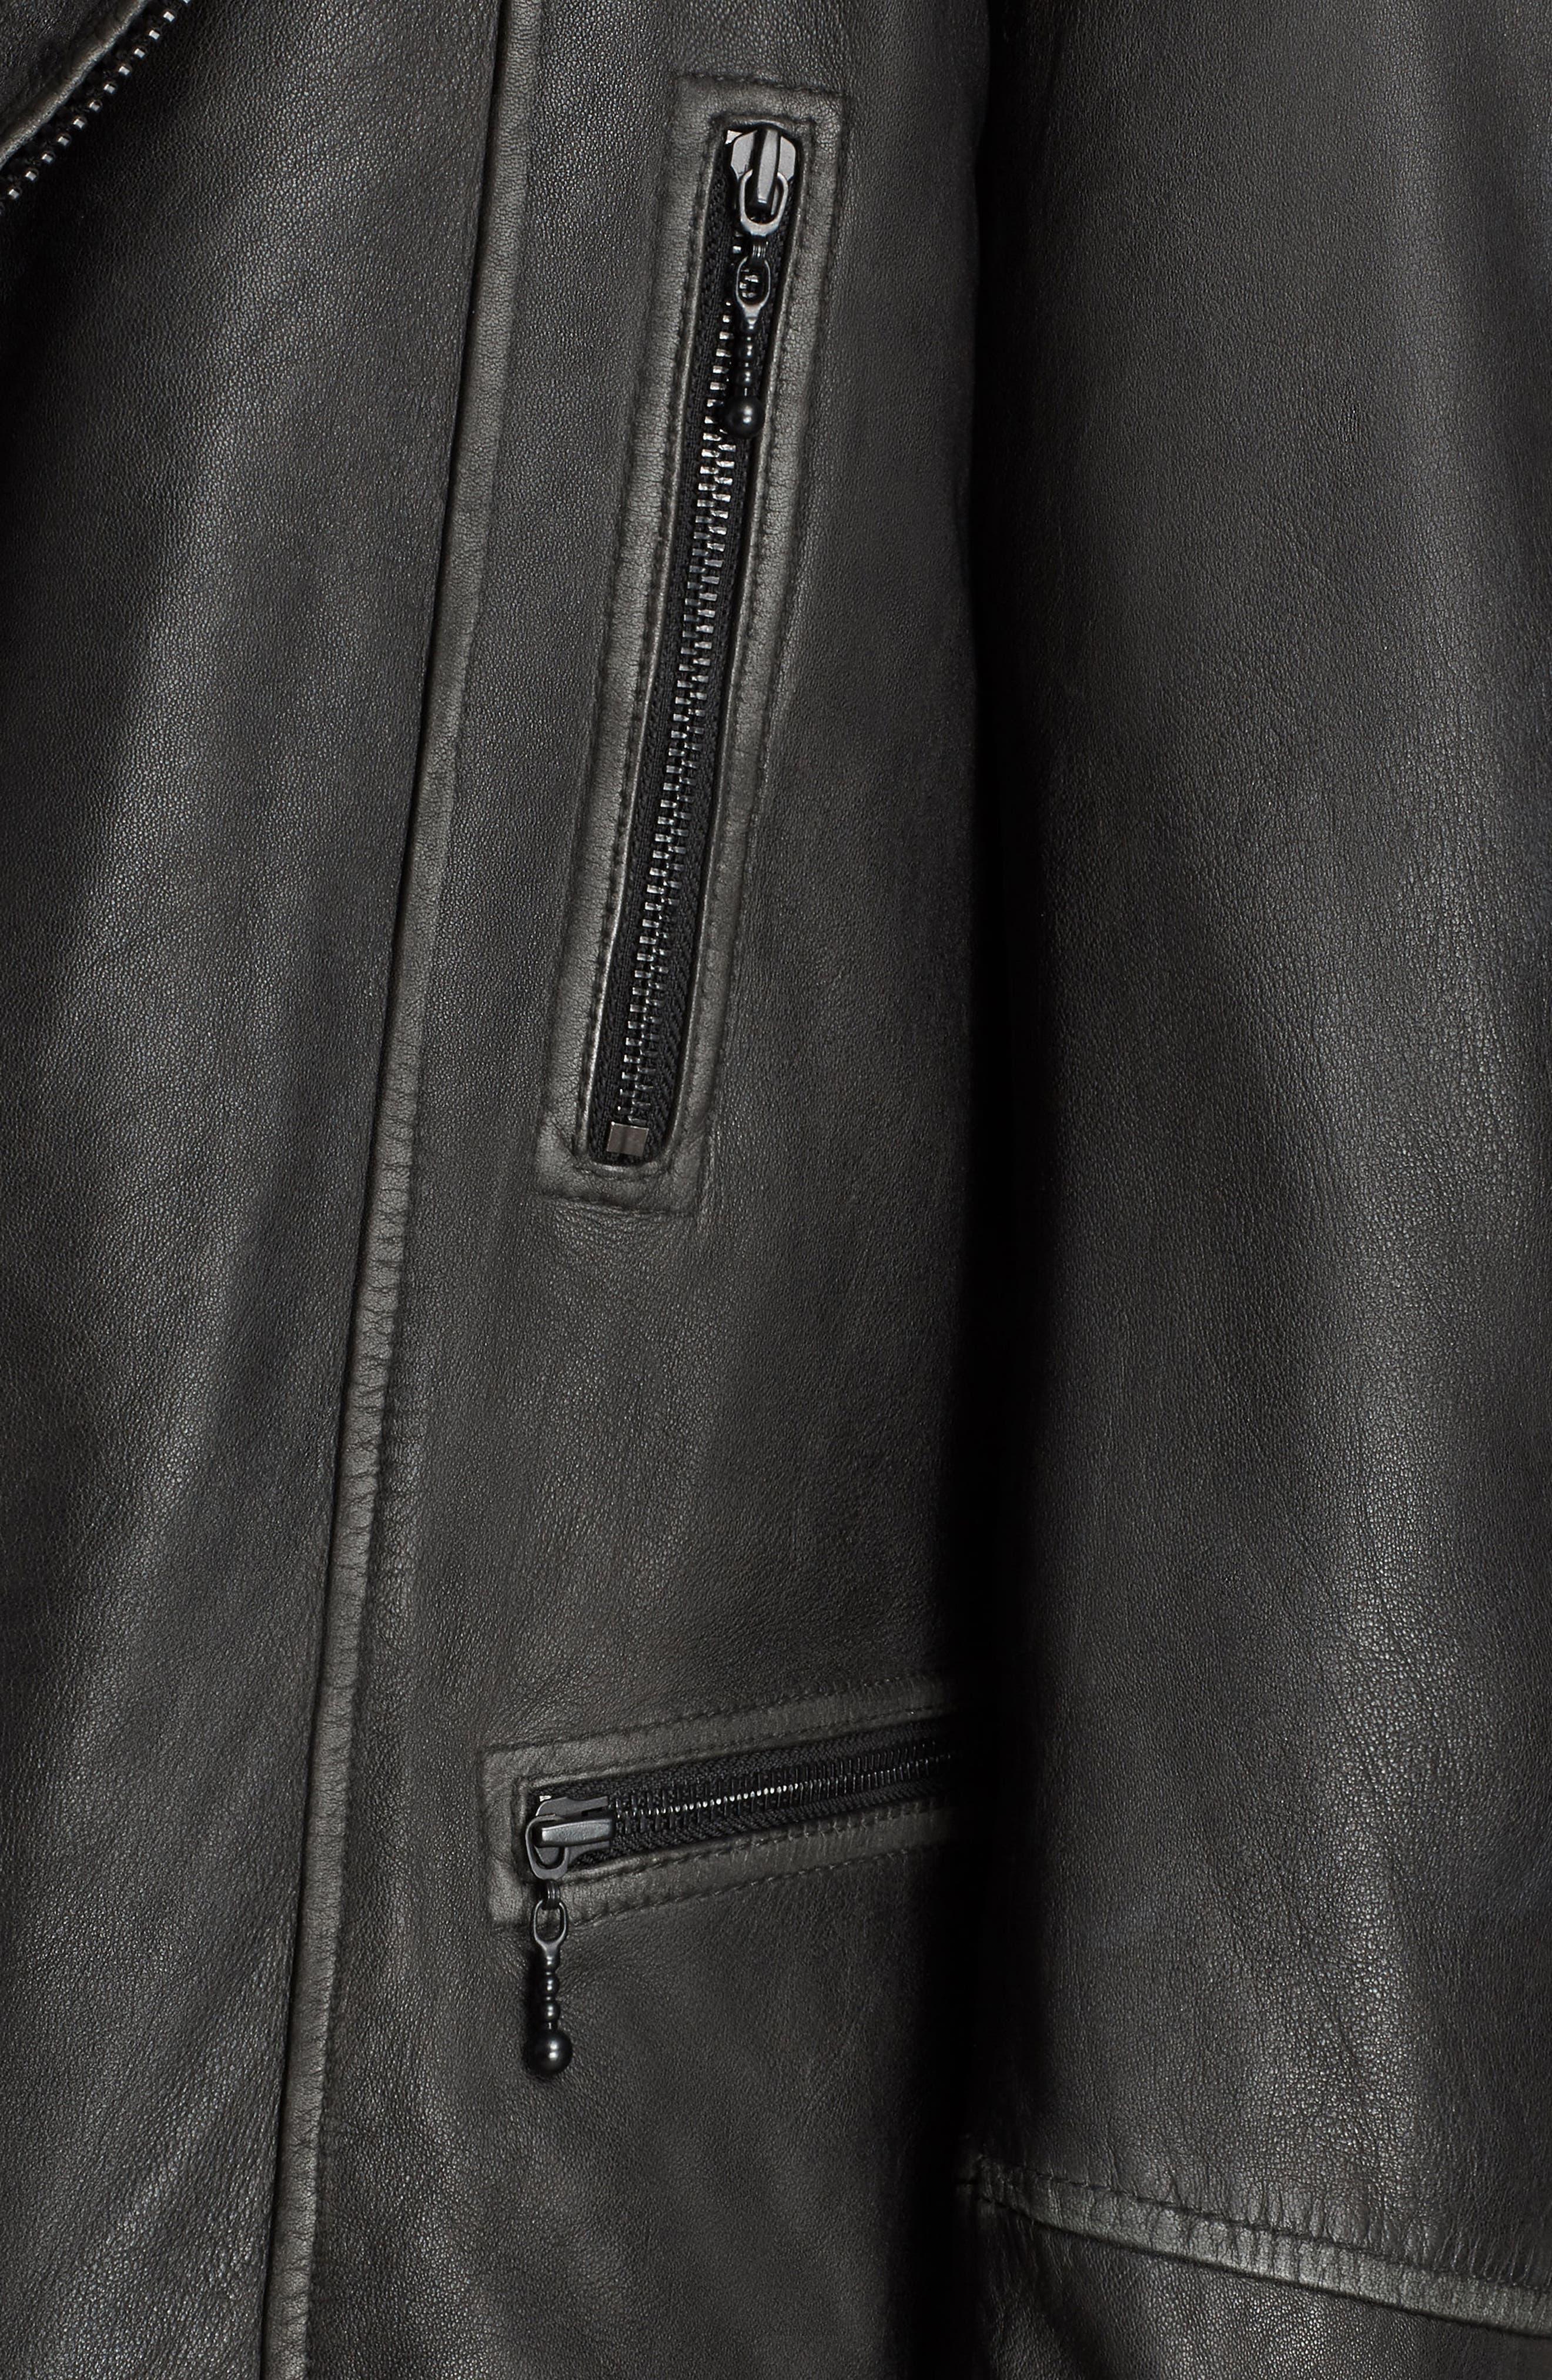 ALLSAINTS, Cargo Biker Slim Fit Leather Jacket, Alternate thumbnail 8, color, BLACK GREY